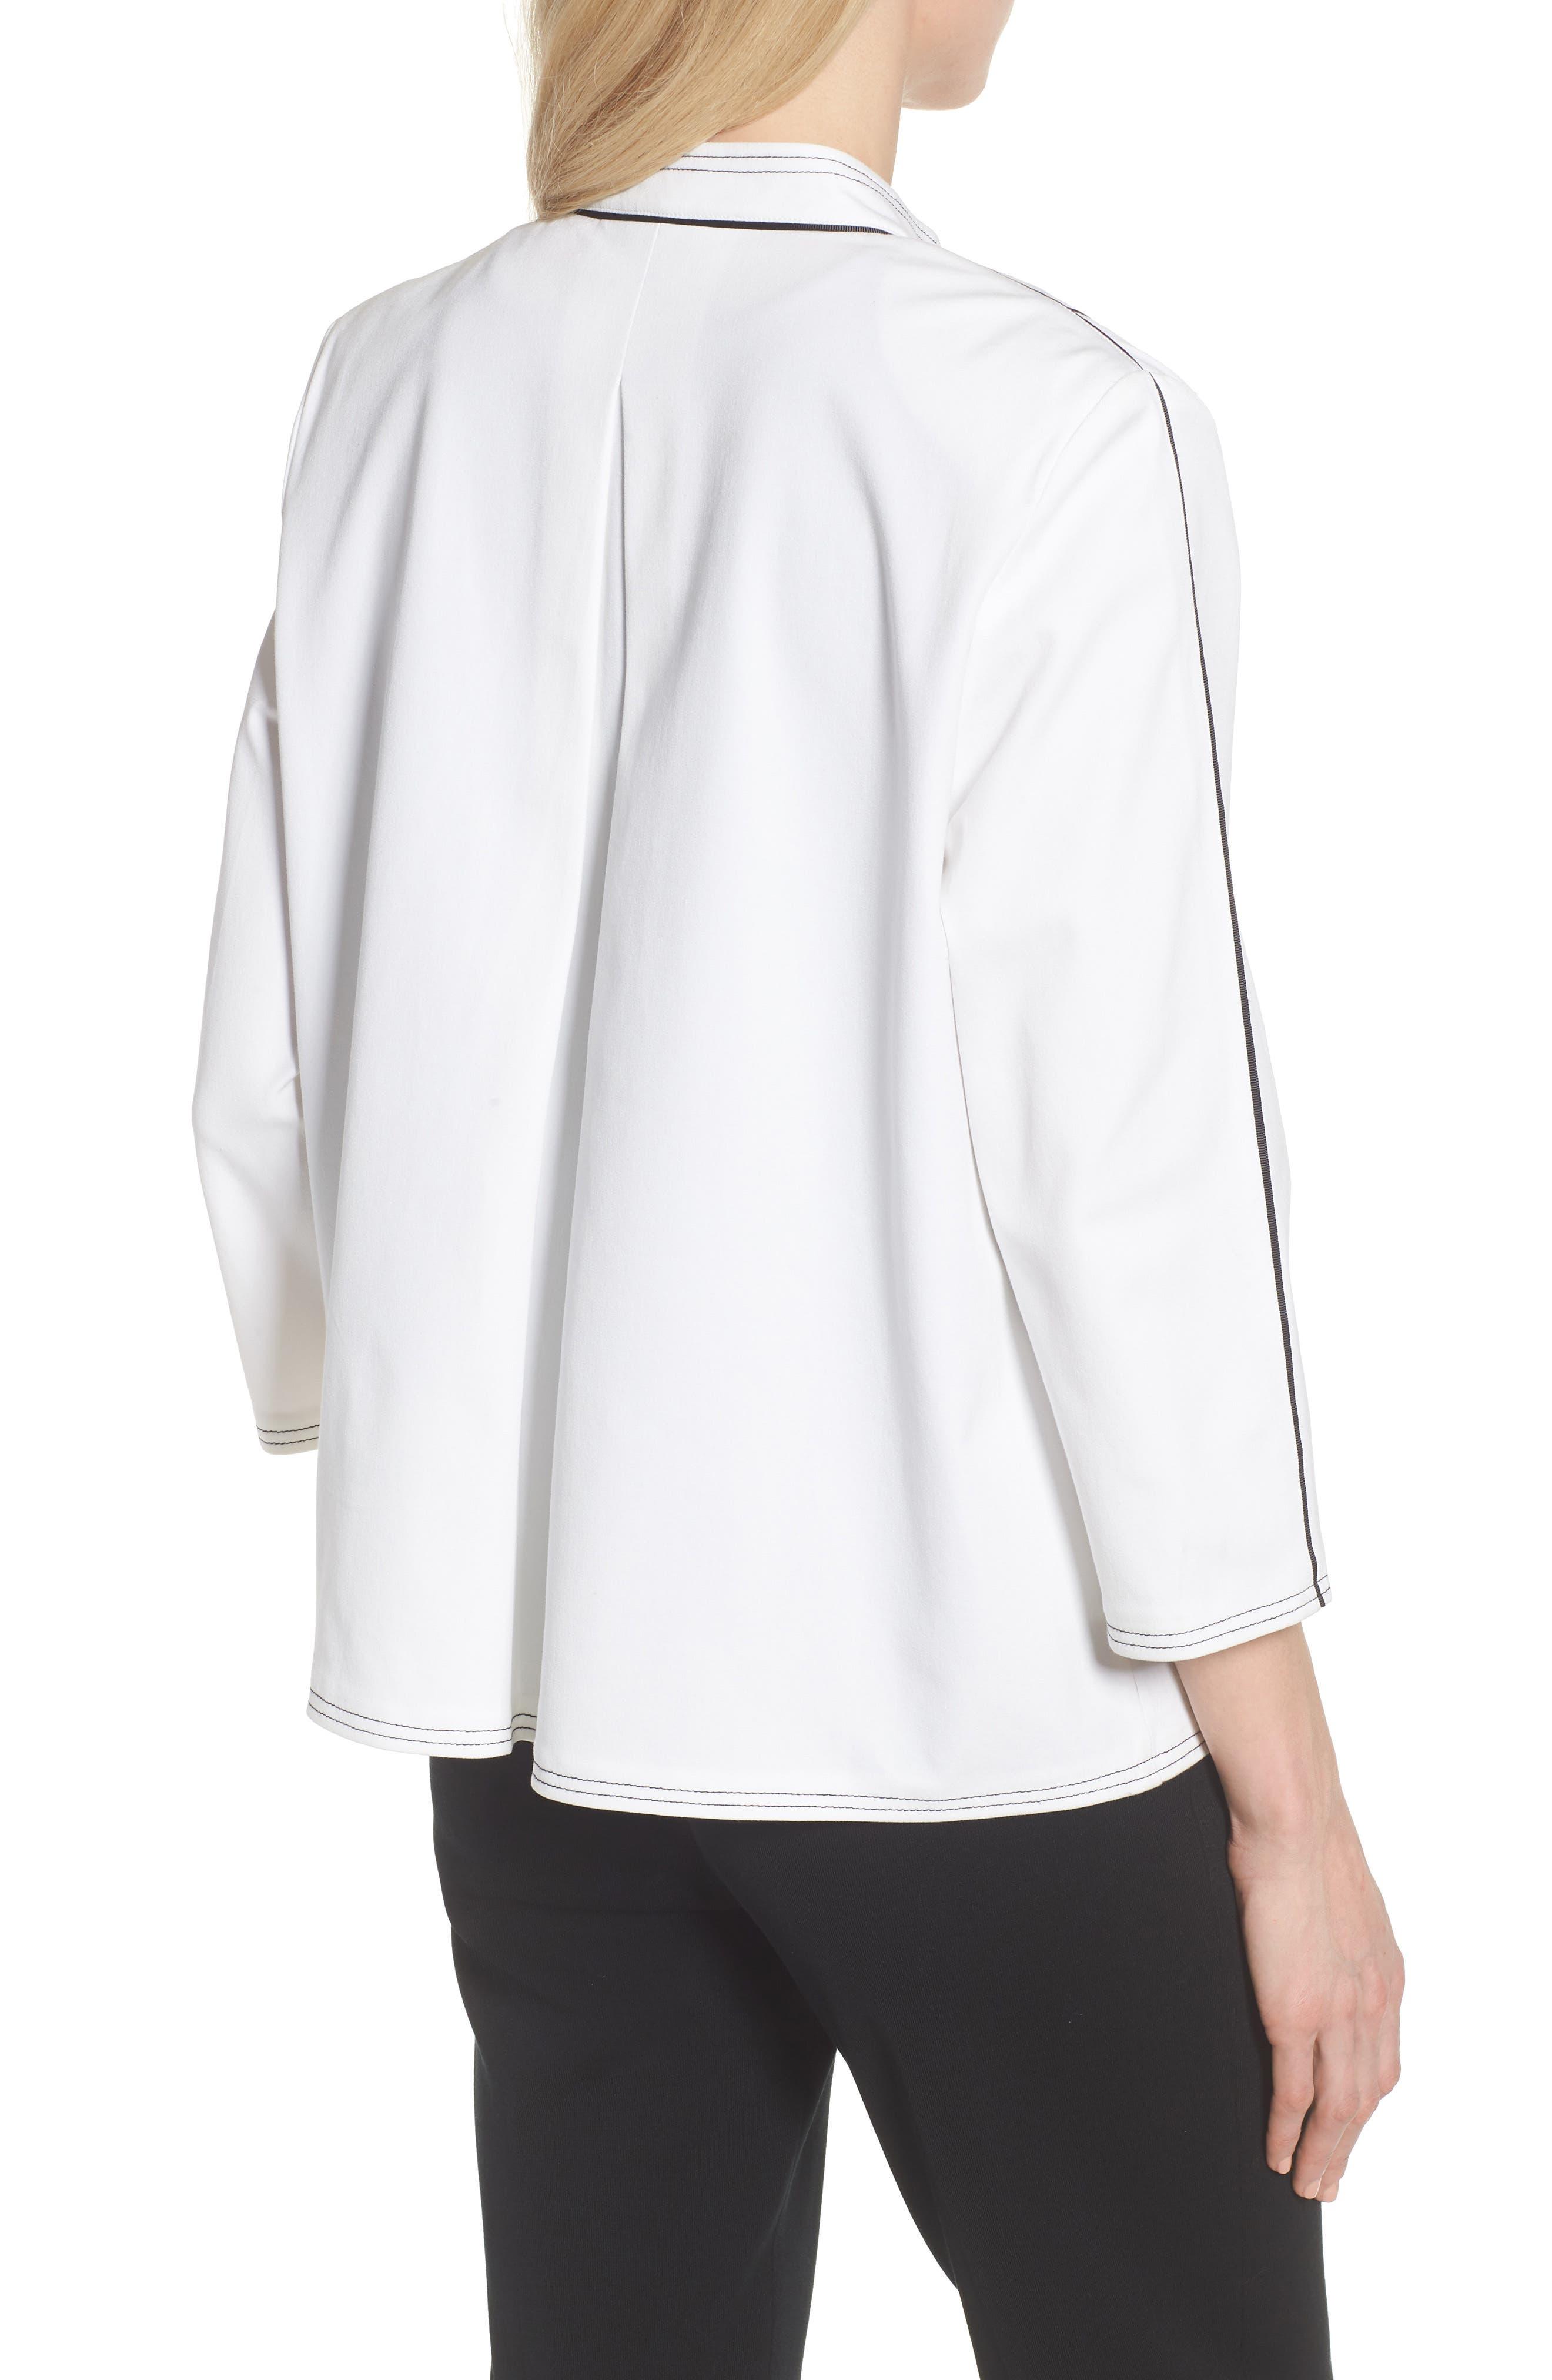 Mandarin Collar Stitch Trim Jacket,                             Alternate thumbnail 2, color,                             White/ Black